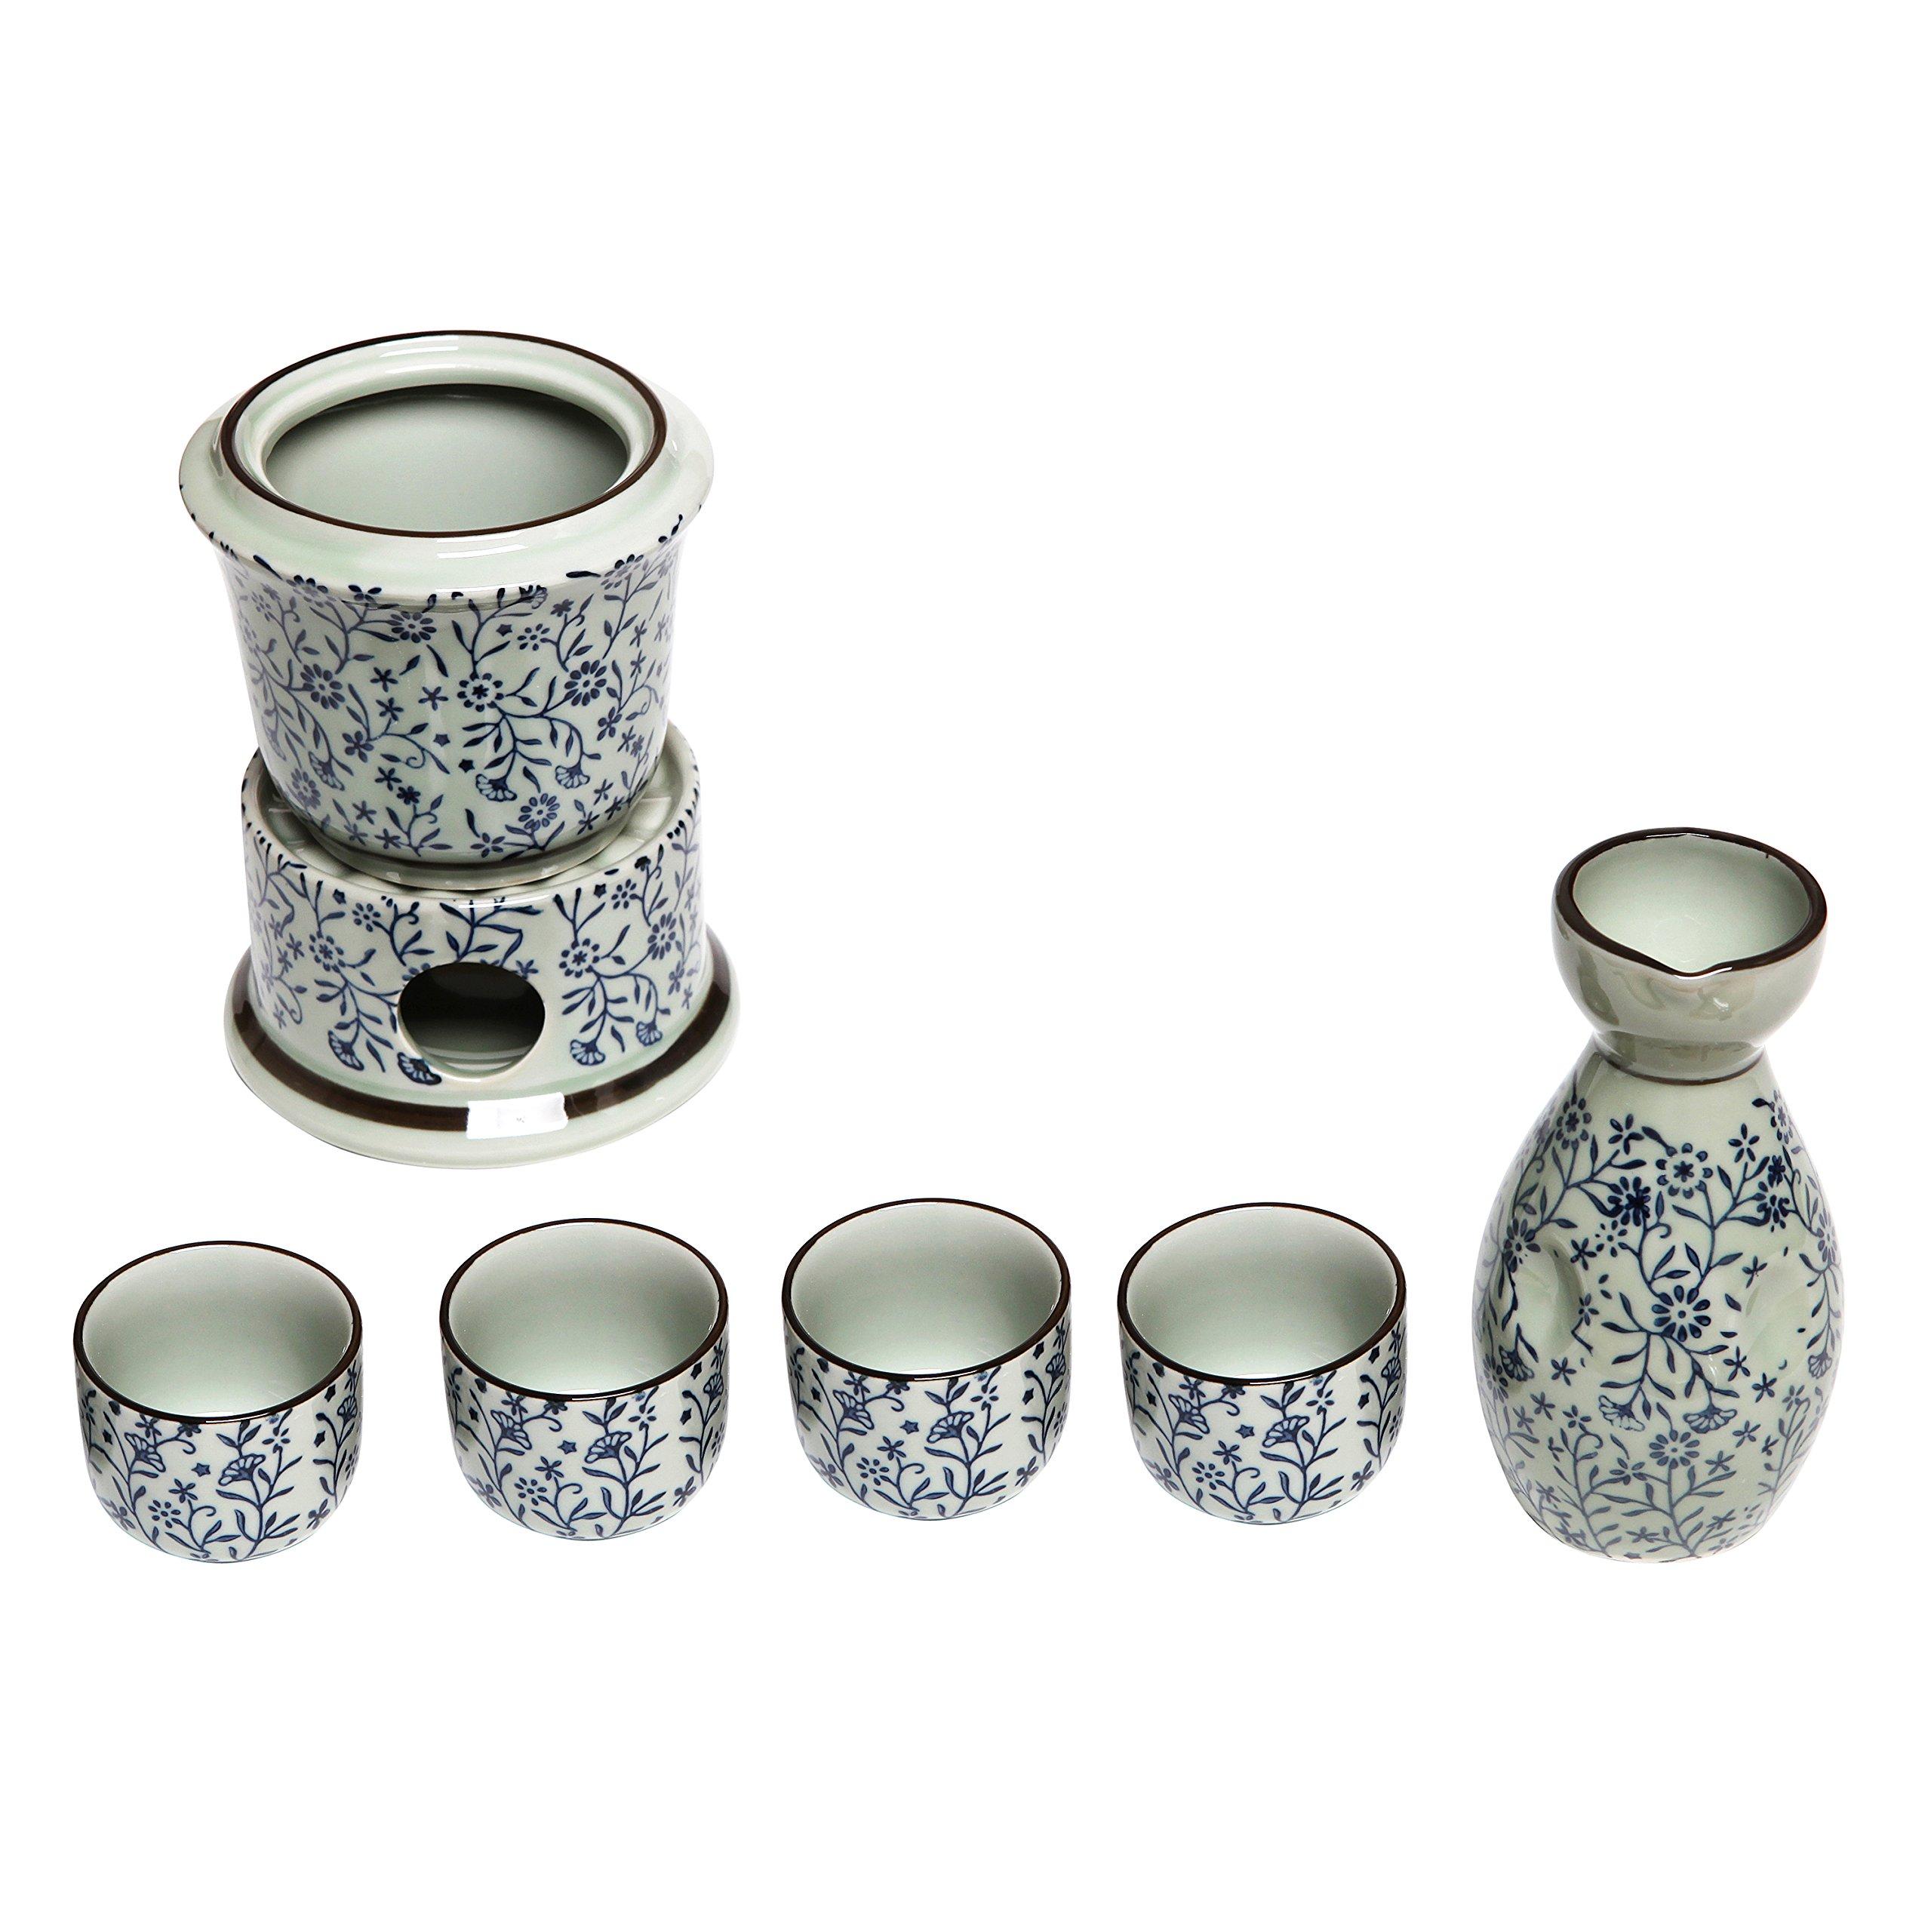 Exquisite Ceramic Blue Flowers Japanese Sake Set w/ 4 Shot Glass / Cups, Serving Carafe & Warmer Bowl